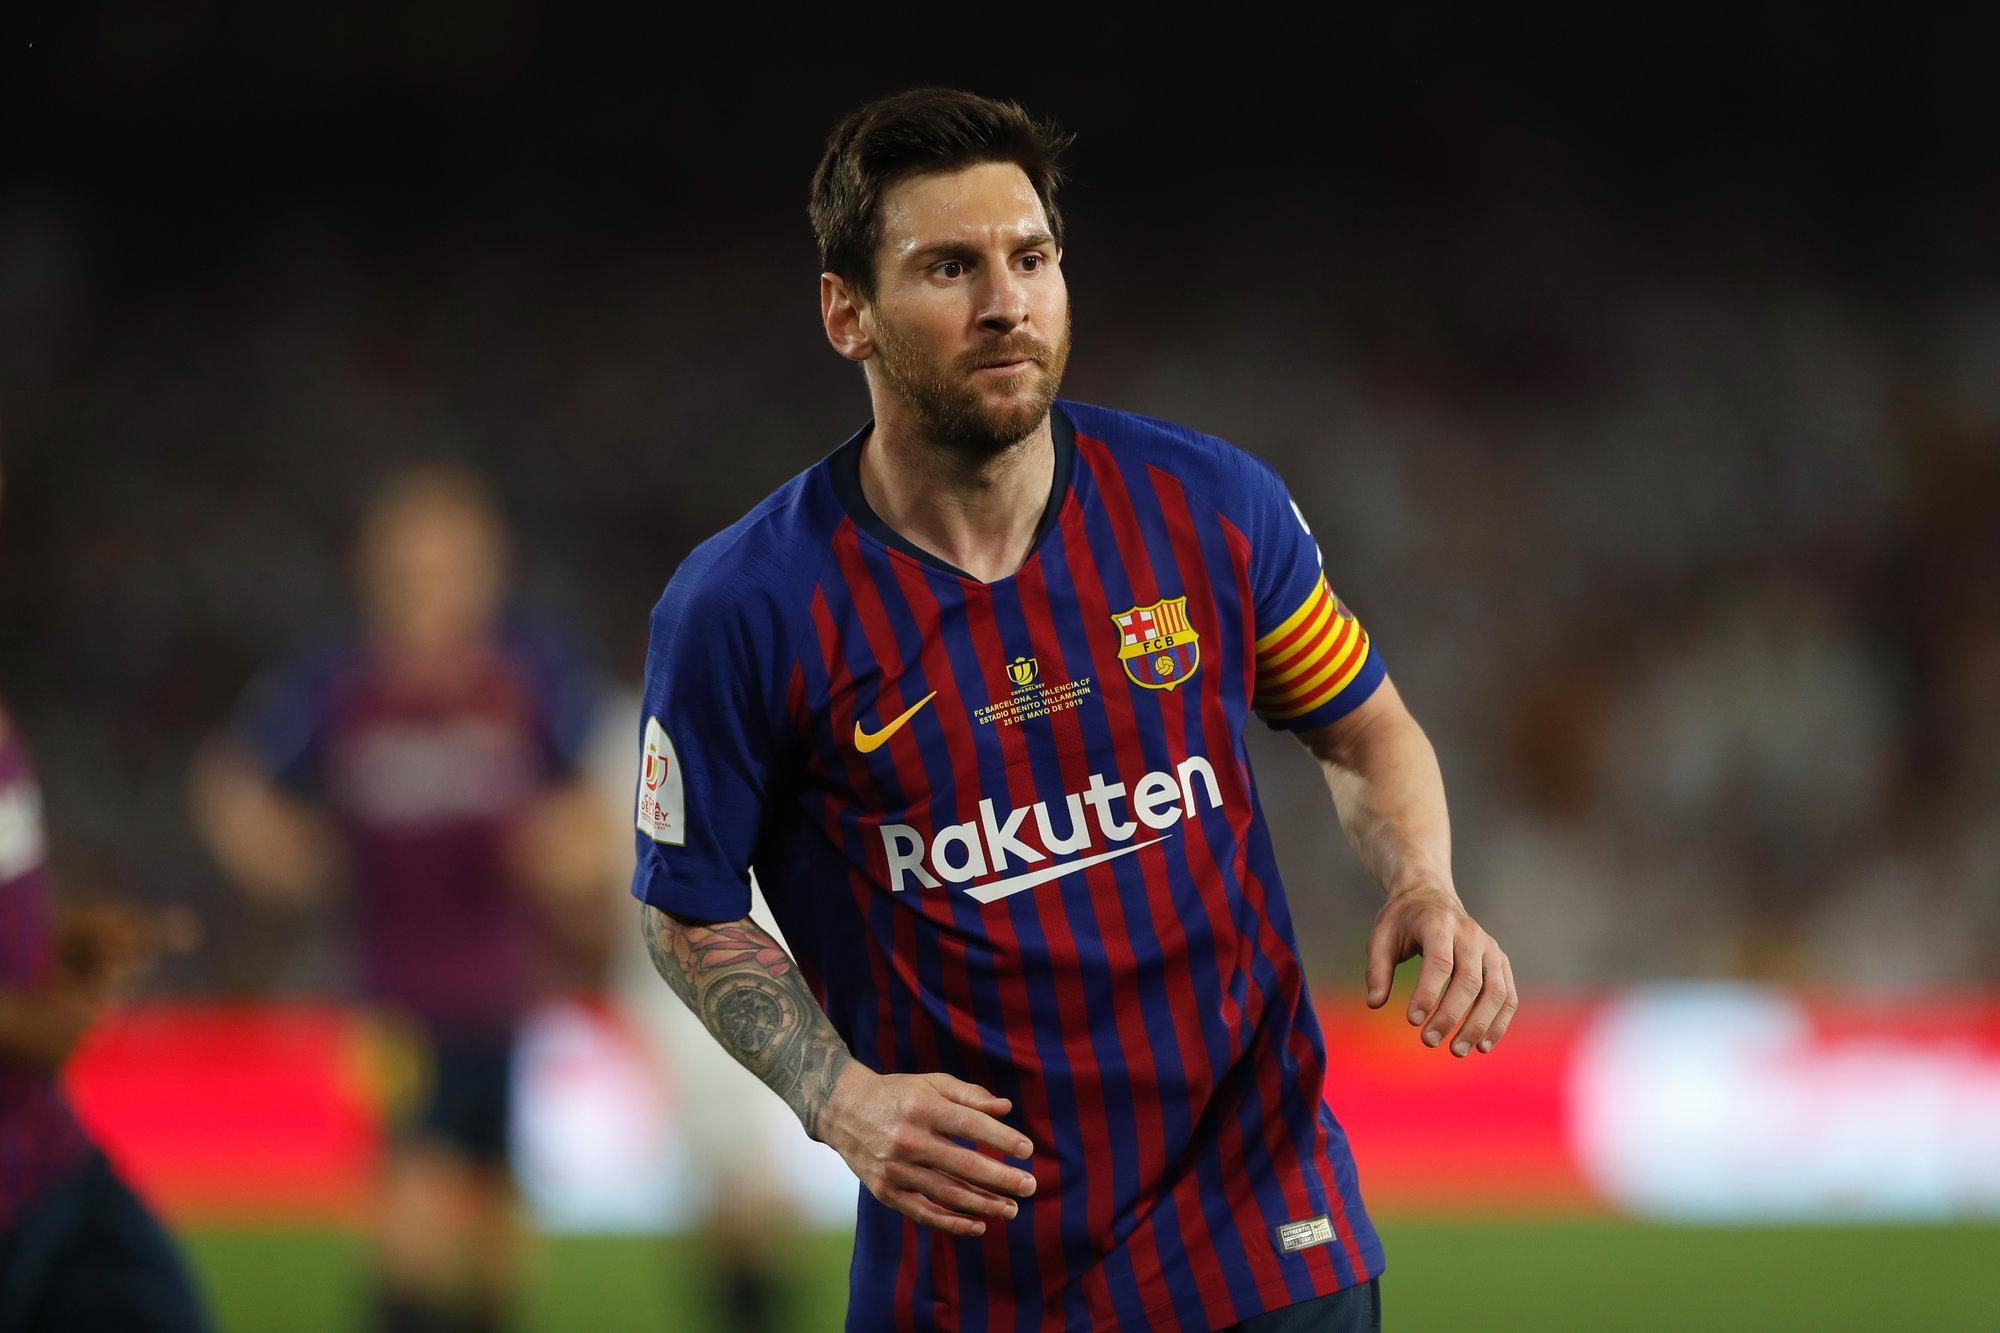 Барселона ювентус 12 сентября 2019 гол месси [PUNIQRANDLINE-(au-dating-names.txt) 56